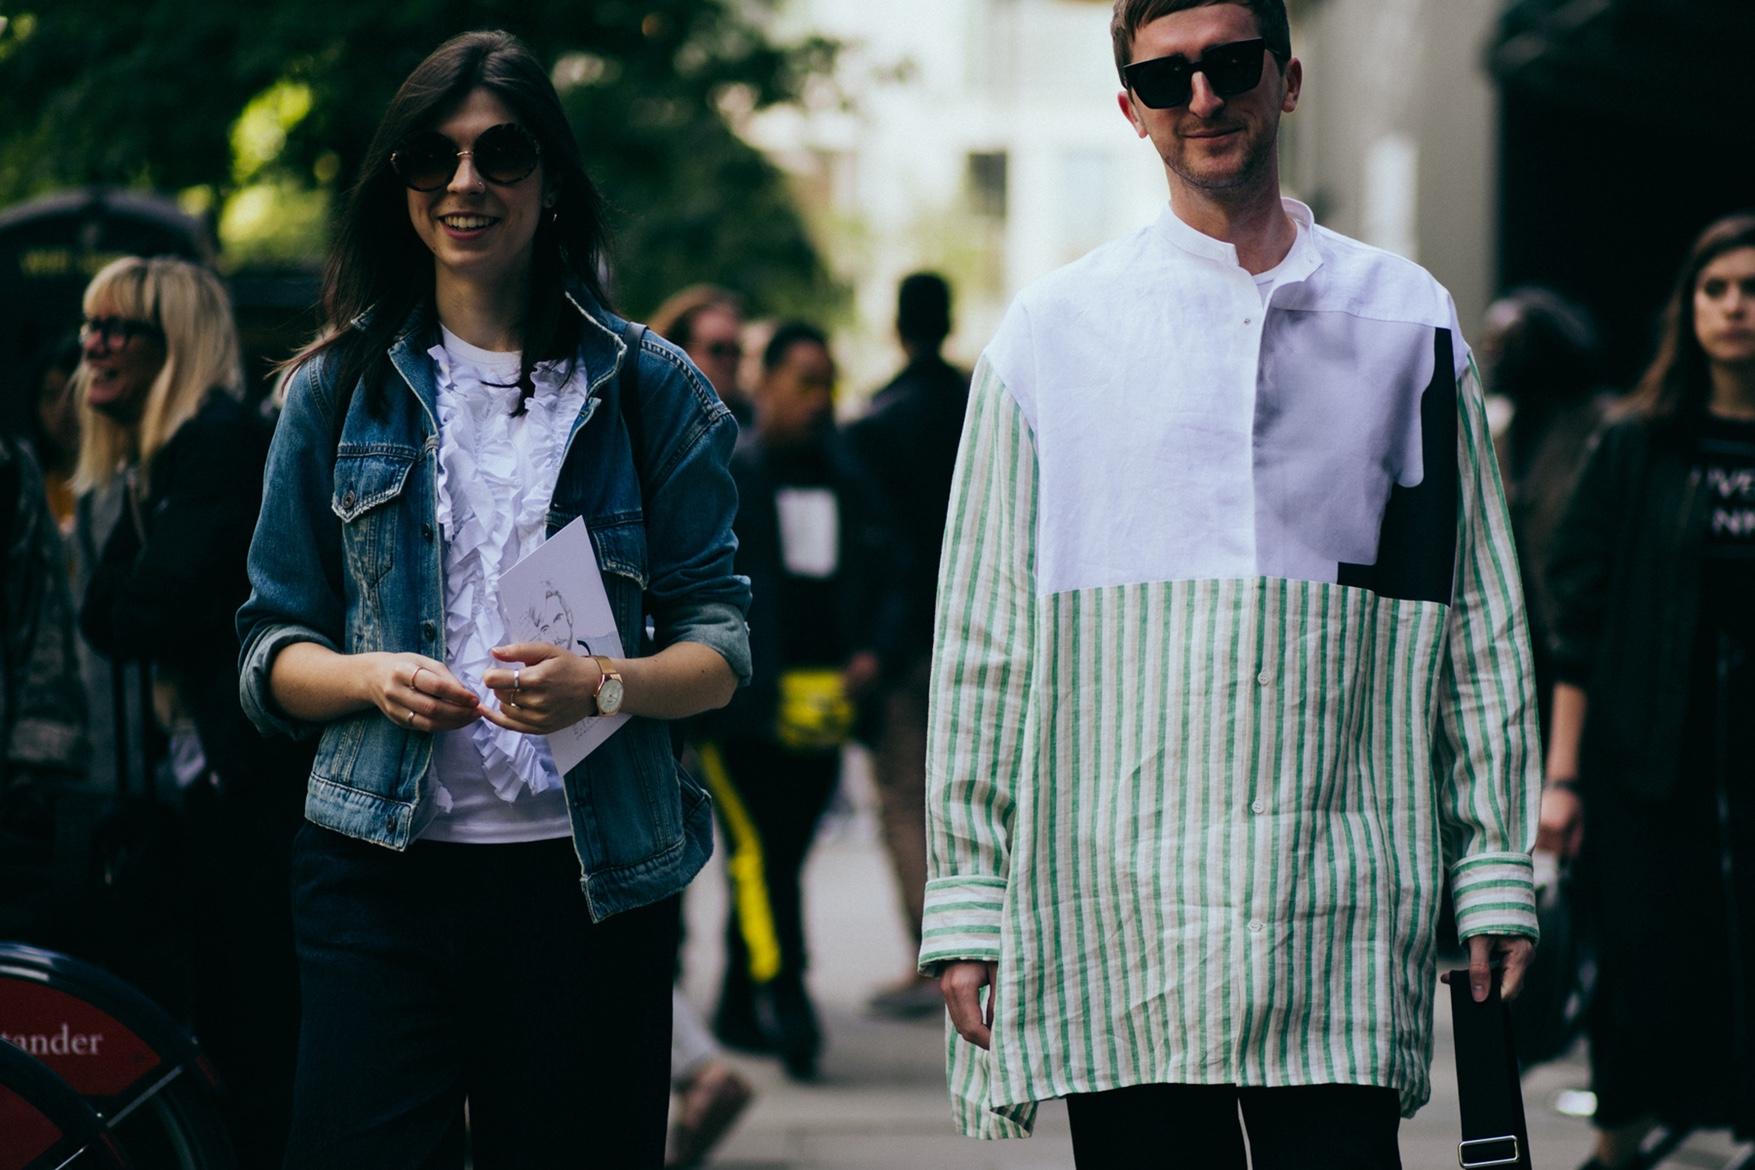 http-%2F%2Fhypebeast.com%2Fimage%2F2017%2F06%2FStreet-Style-London-Fashion-Week-Mens-Spring-2.jpg